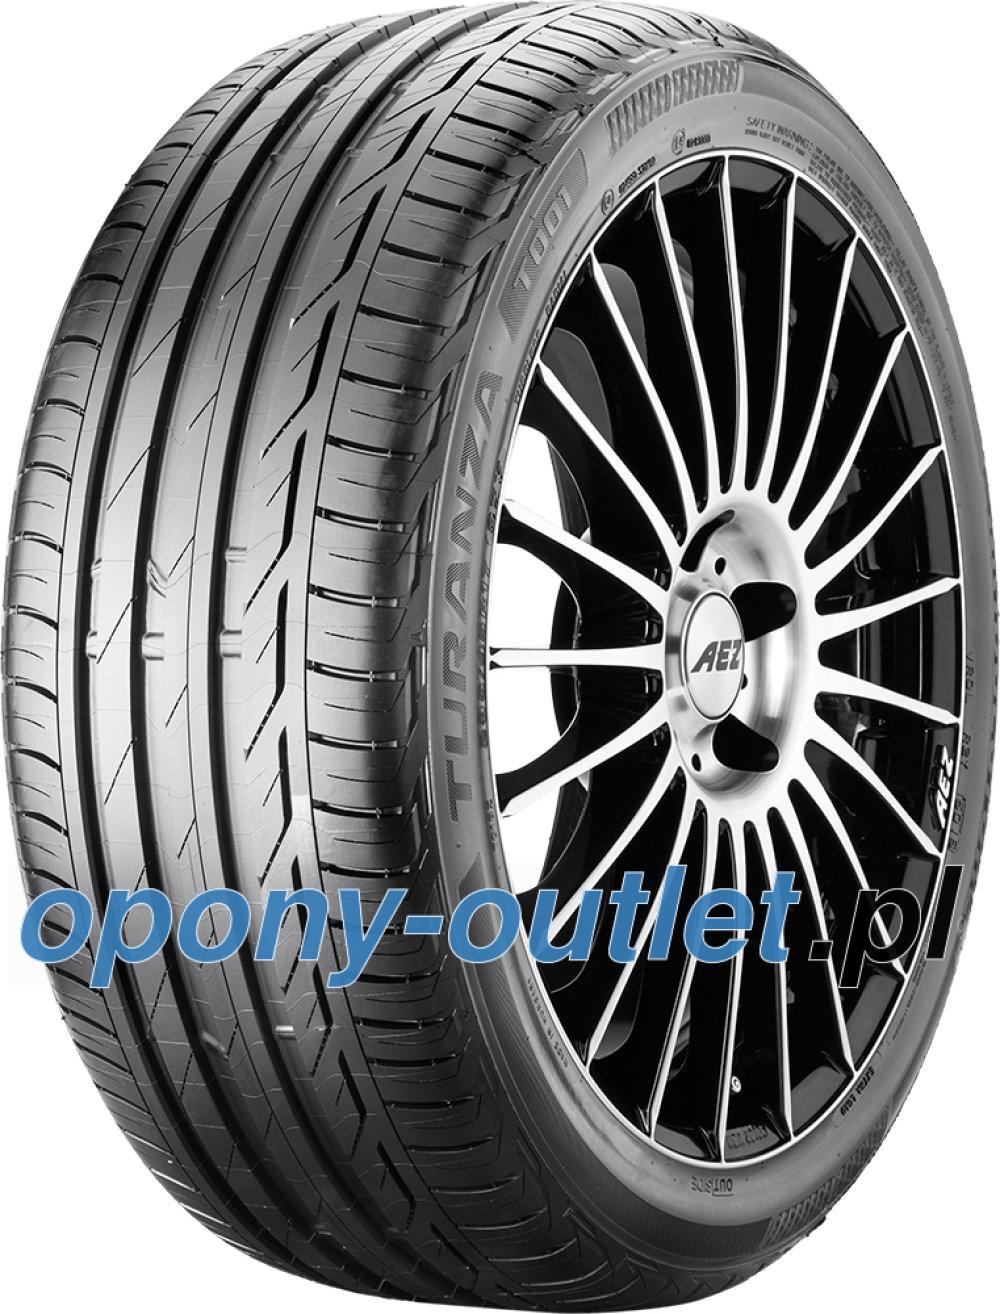 Bridgestone Turanza T001 Evo ( 245/40 R18 93Y osłona felgi (MFS) )